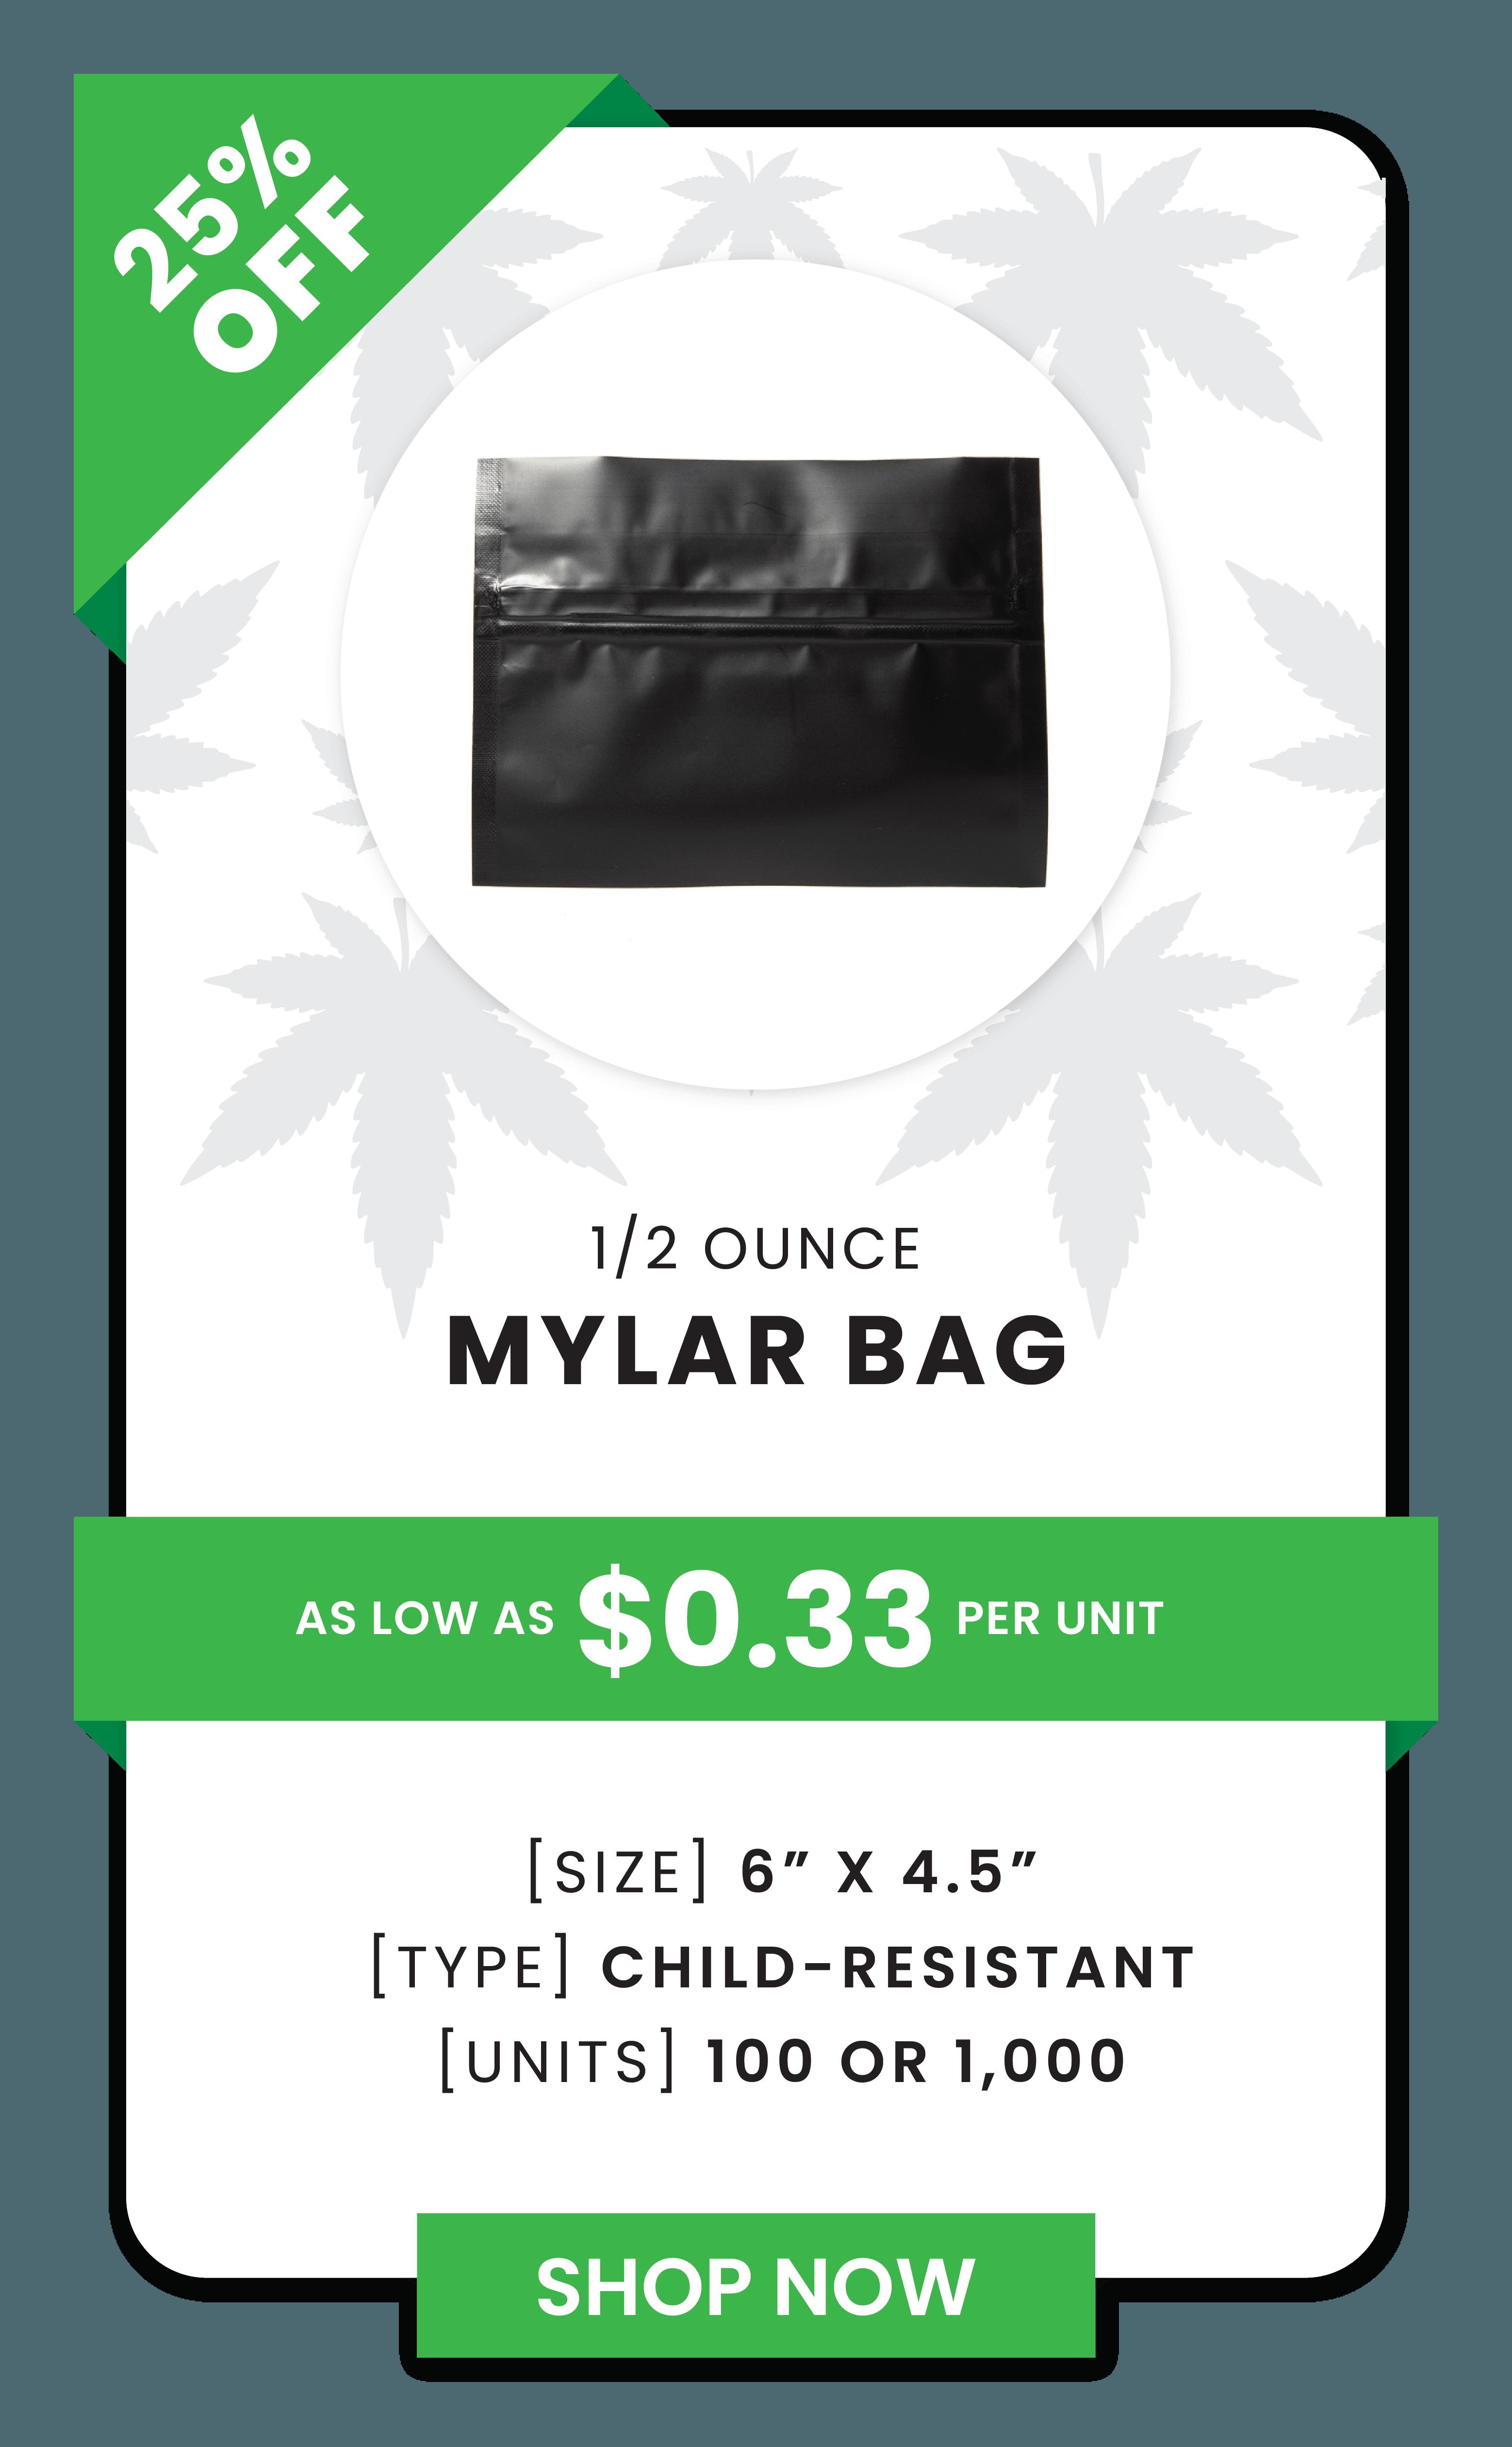 DSC-dispensary-supply-canada-sales-mylar-bag-12ounce